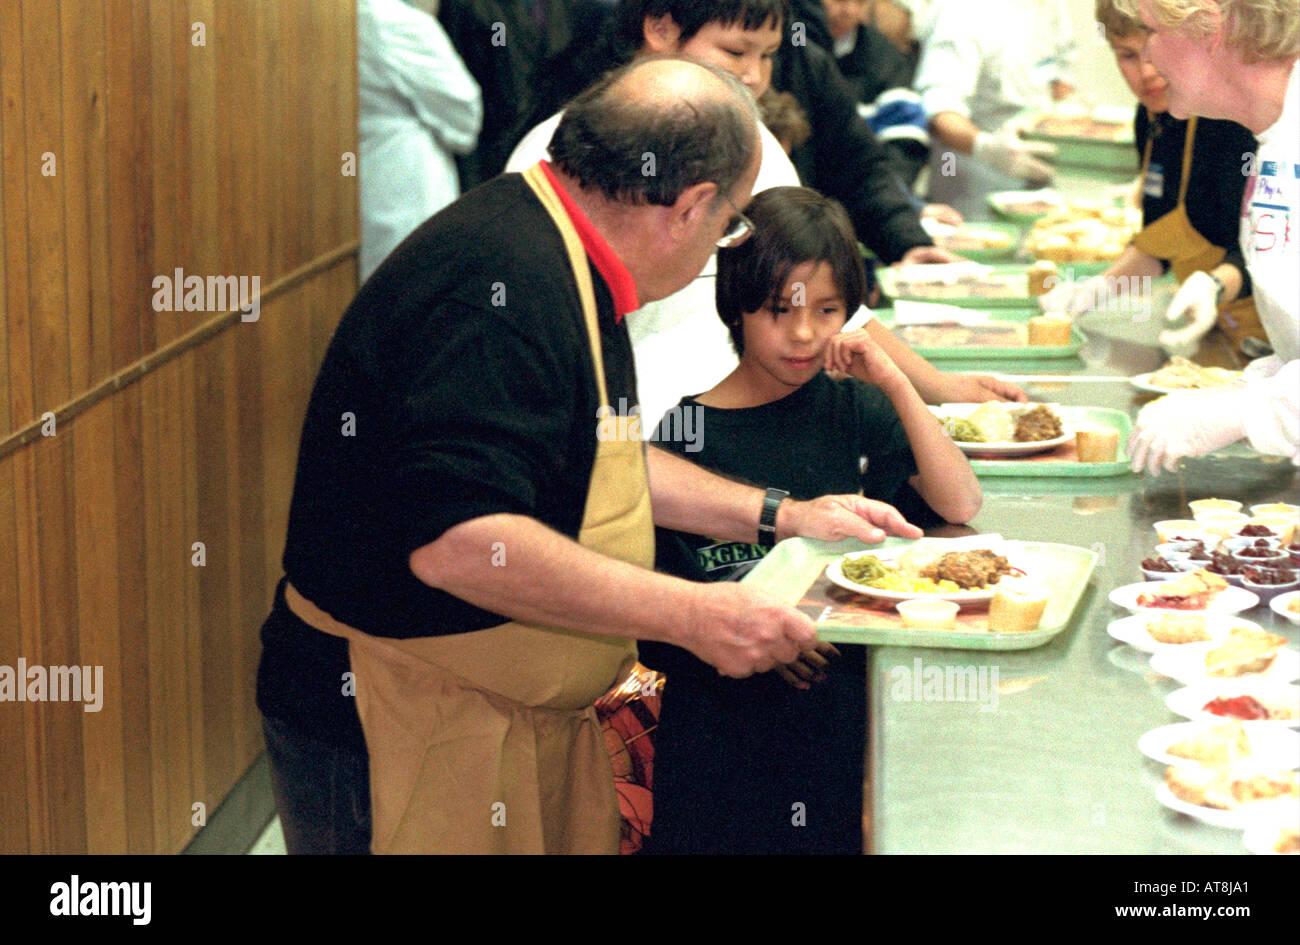 volunteer service hunger helping stock photos & volunteer service